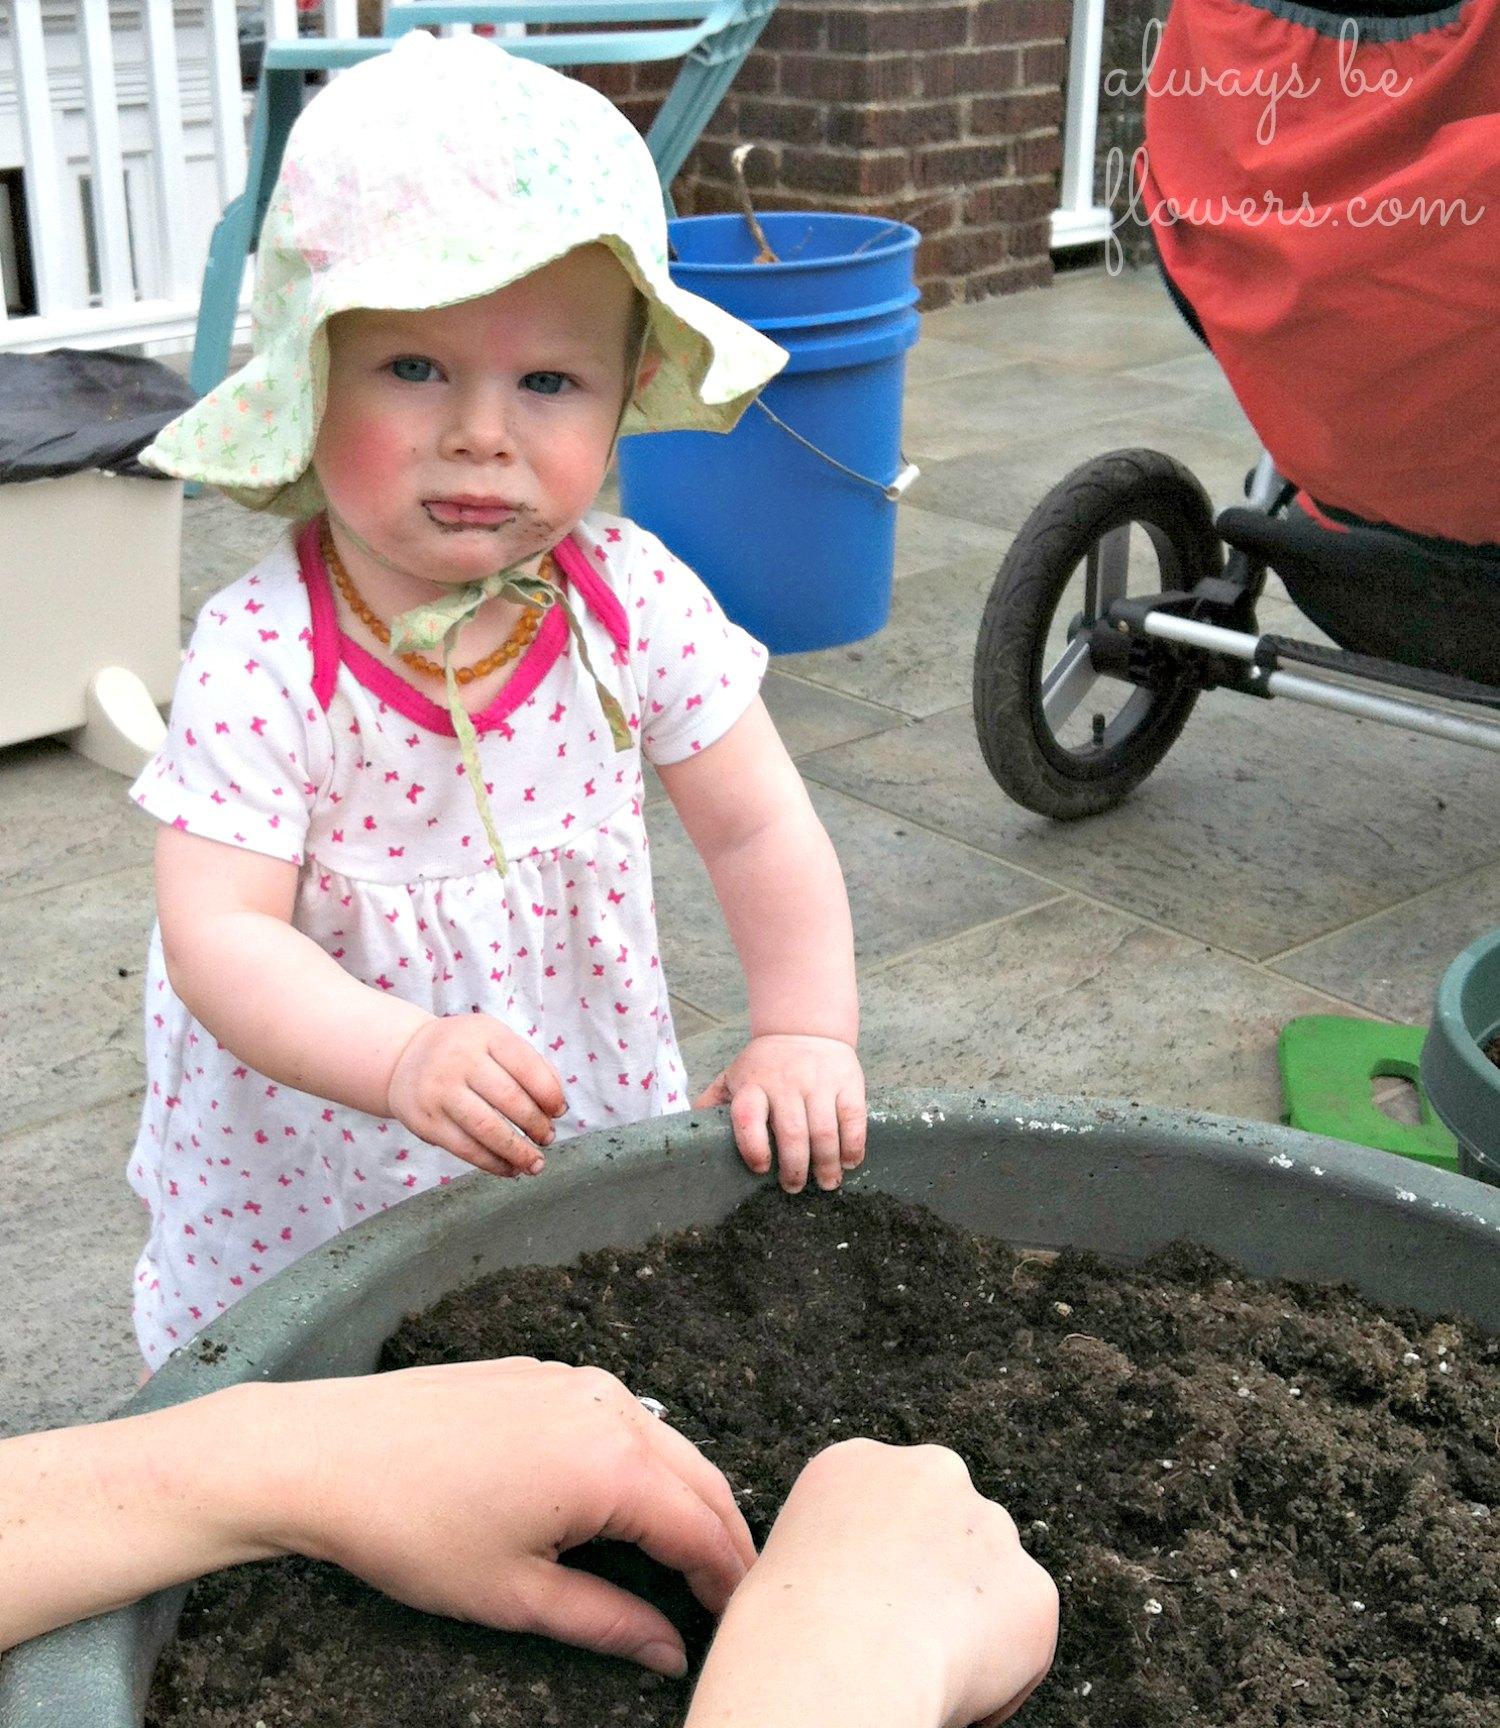 Gardening with my toddler.